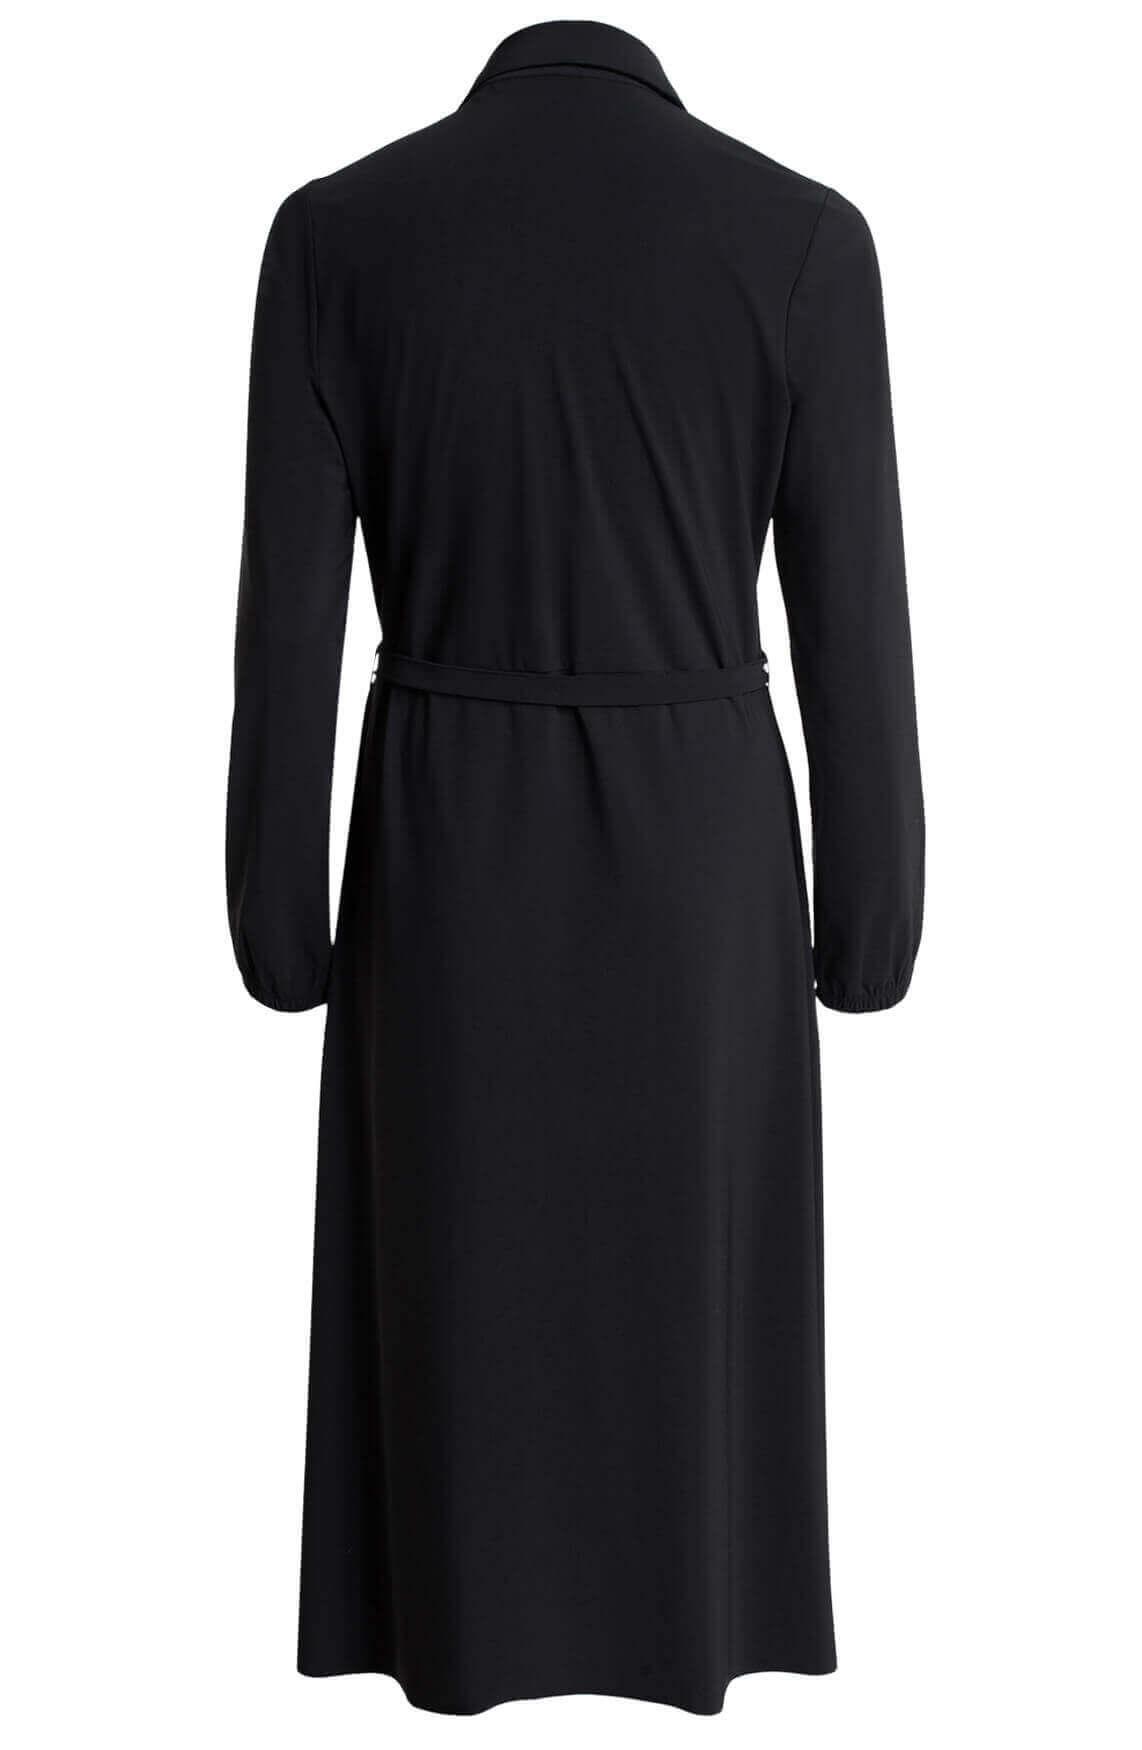 Moscow Dames Nika jurk zwart